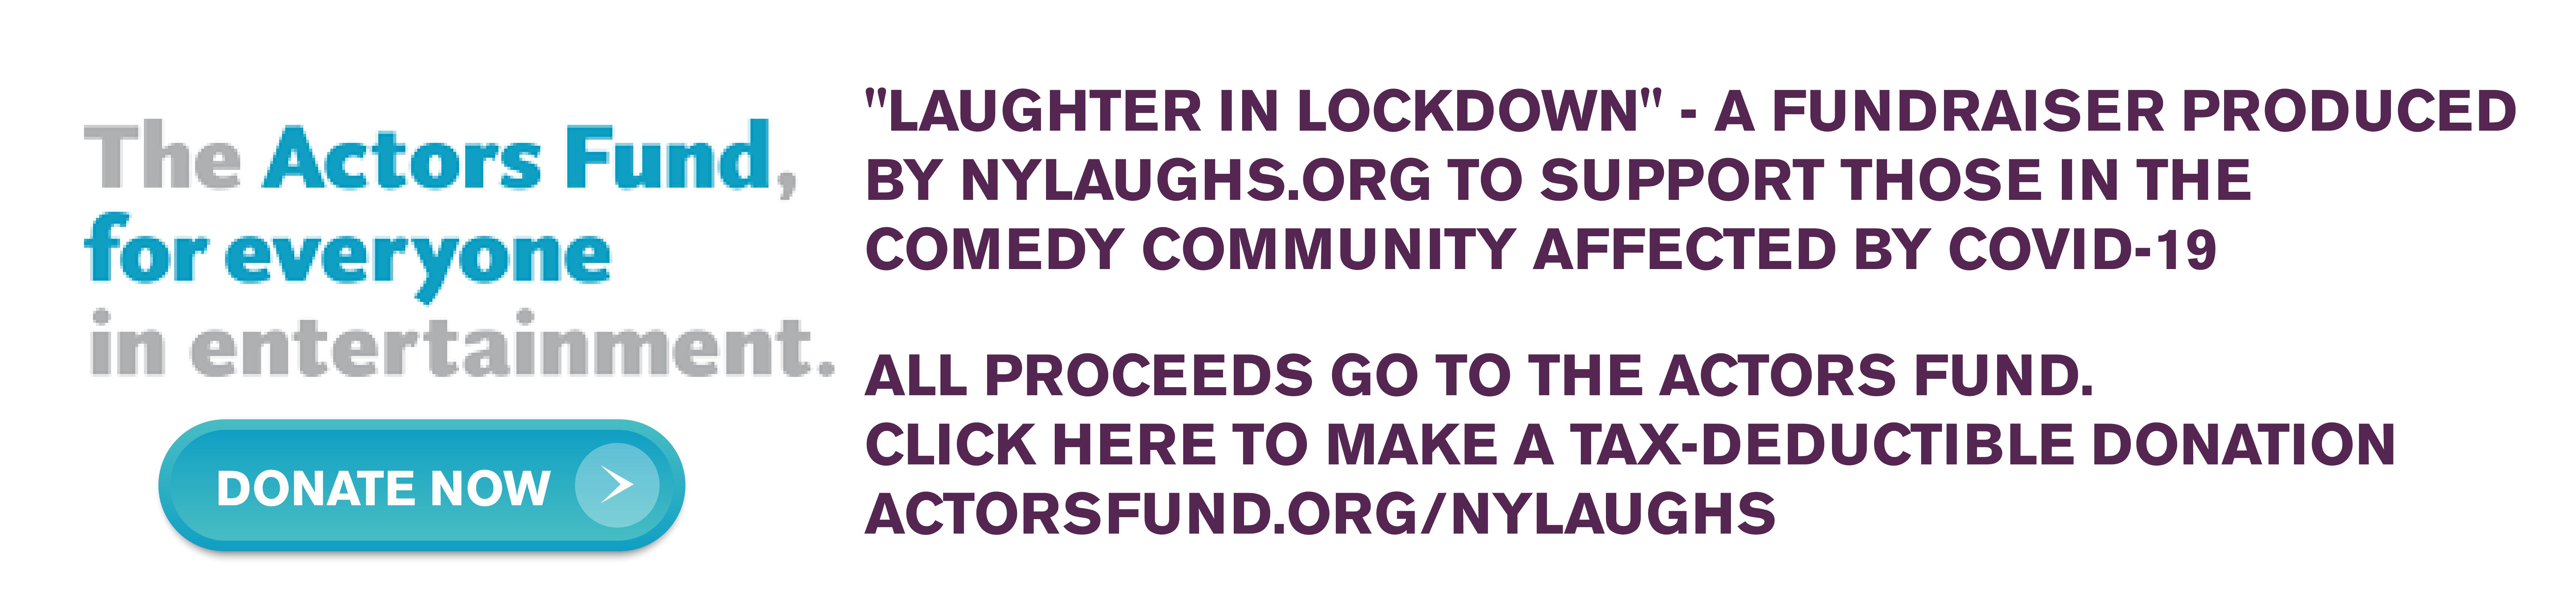 Laughter in Lockdown 2020!